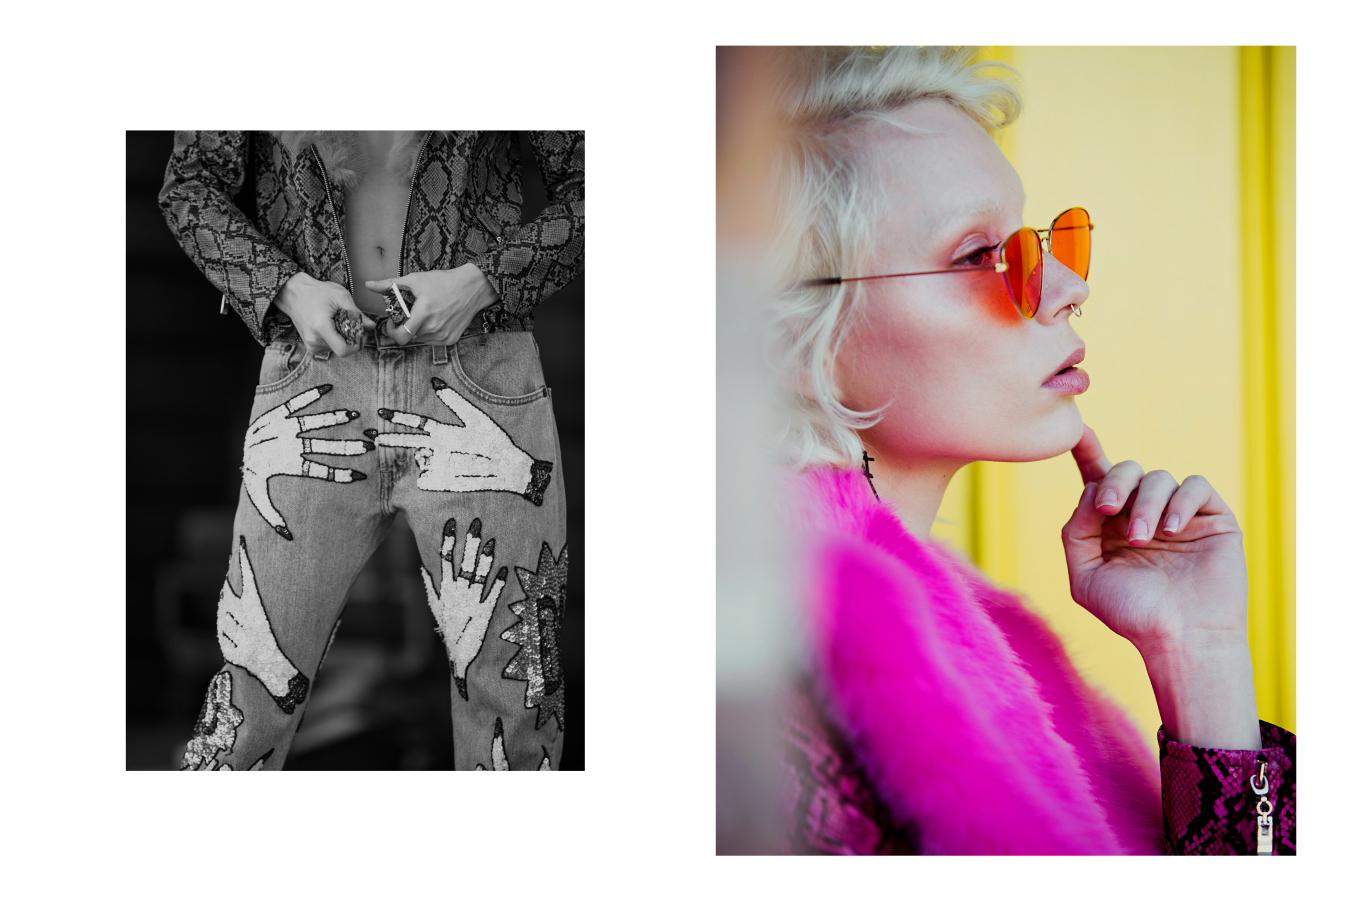 Jacket Laurel & Hector, Jeans Discount universe, Heels Uturn Vintage, Sunglasses Vintage